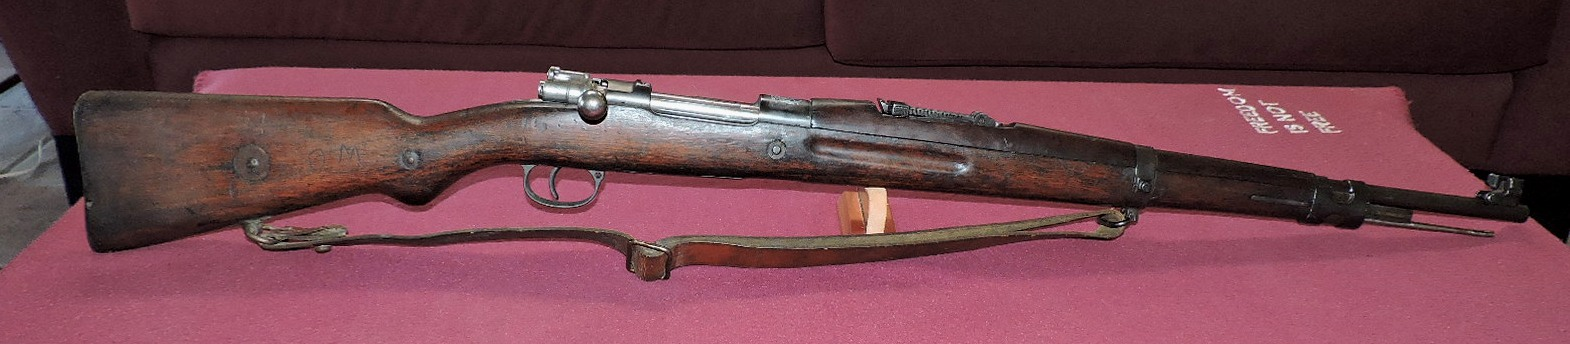 Guatemalan Vz 24 Mauser